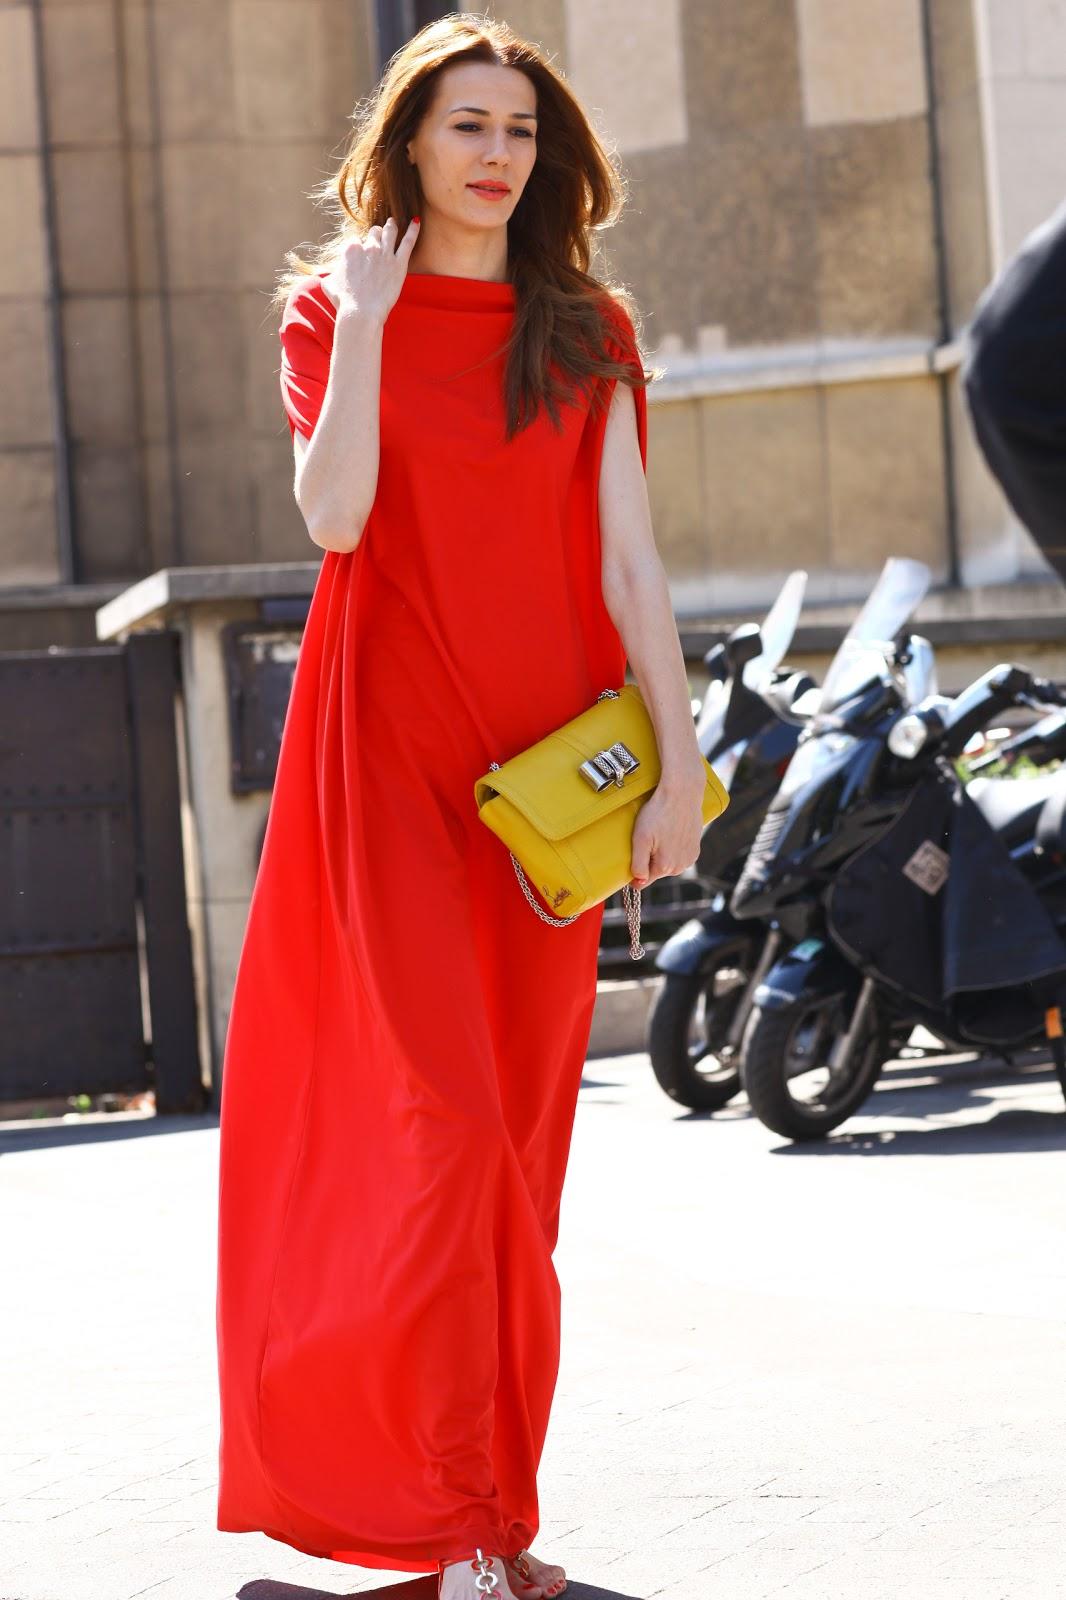 cf5ea8305d06 Ένα κατακόκκινο maxi φόρεμα σε αέρινη λιτή γραμμή ενώ το clutch bag  δημιουργεί μία κομψή αντίθεση.Δύο έντονα χρώματα συνδυασμένα μας προσφέρουν  ένα πολύ ...